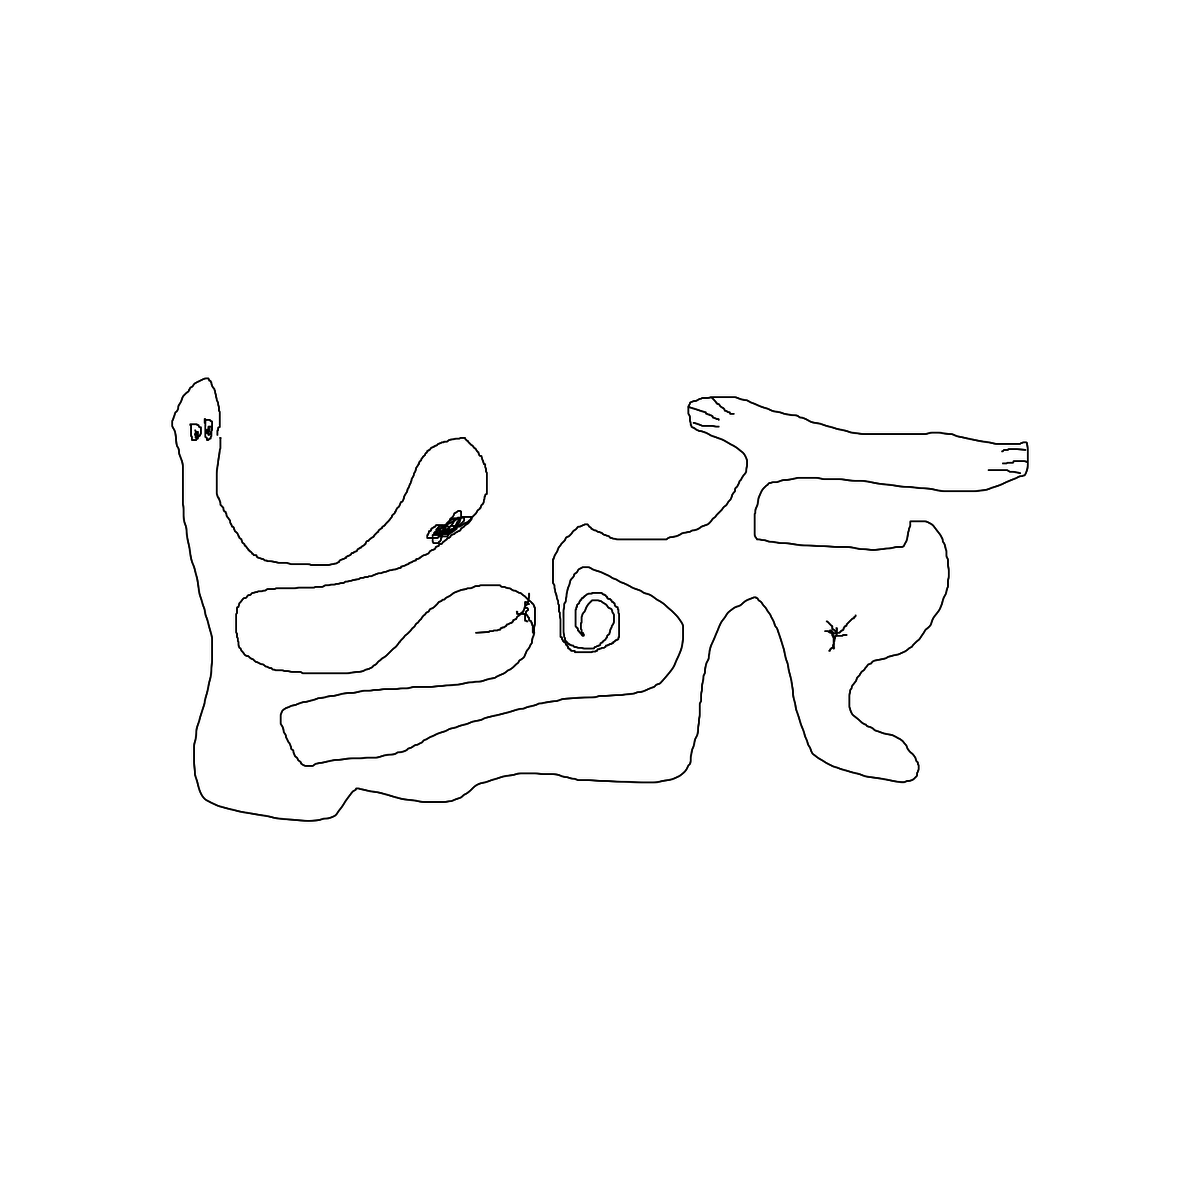 BAAAM drawing#410 lat:46.8541717529296900lng: -71.3330459594726600